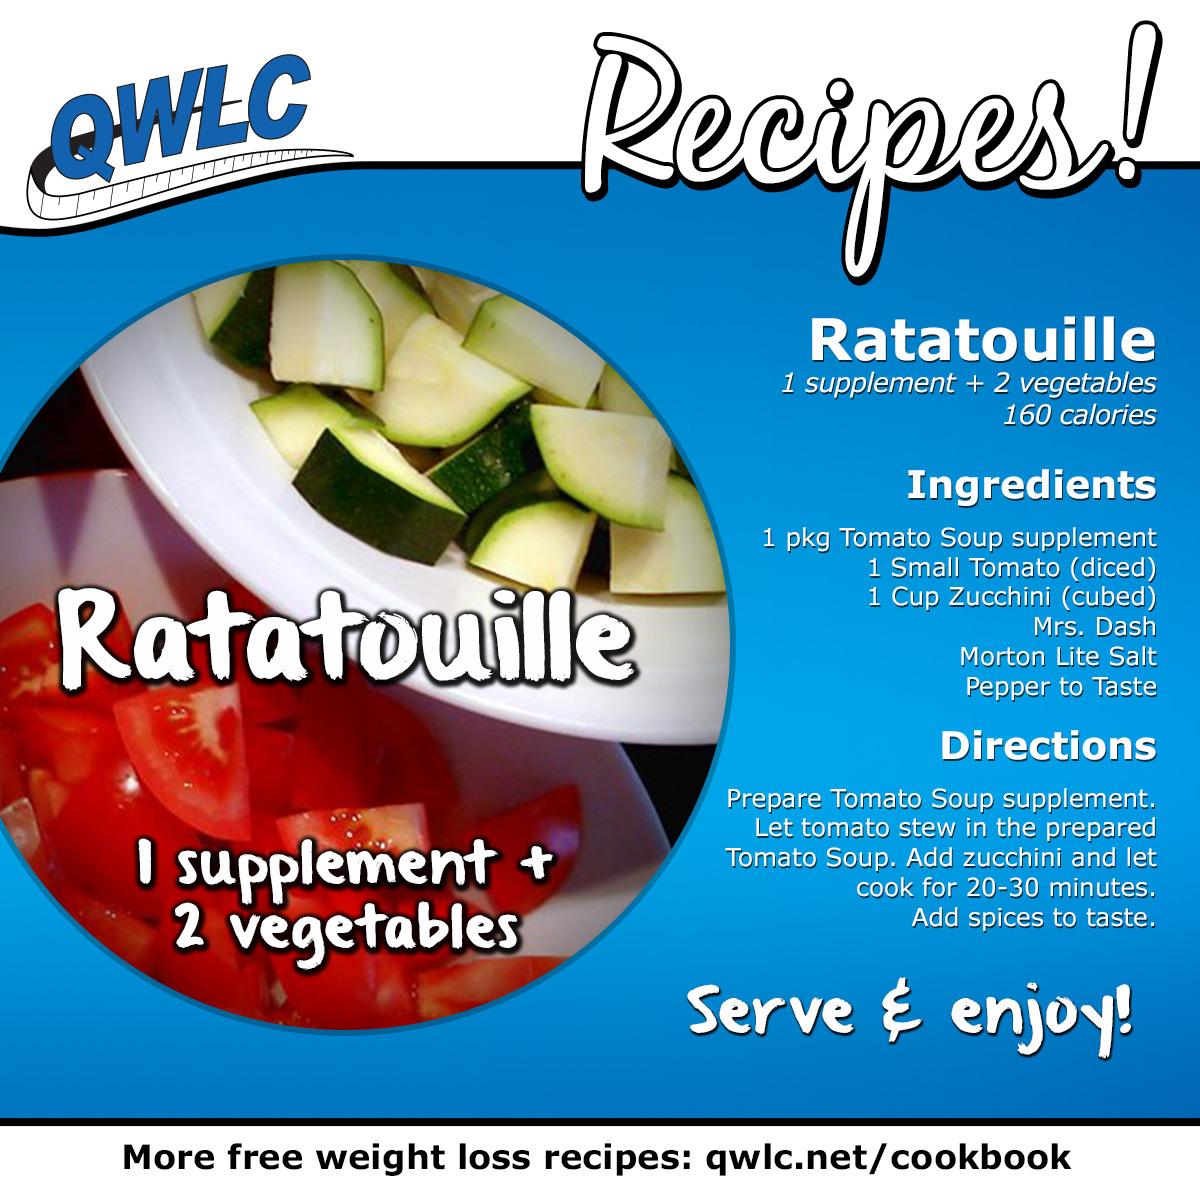 cardiac recipe fast weight loss